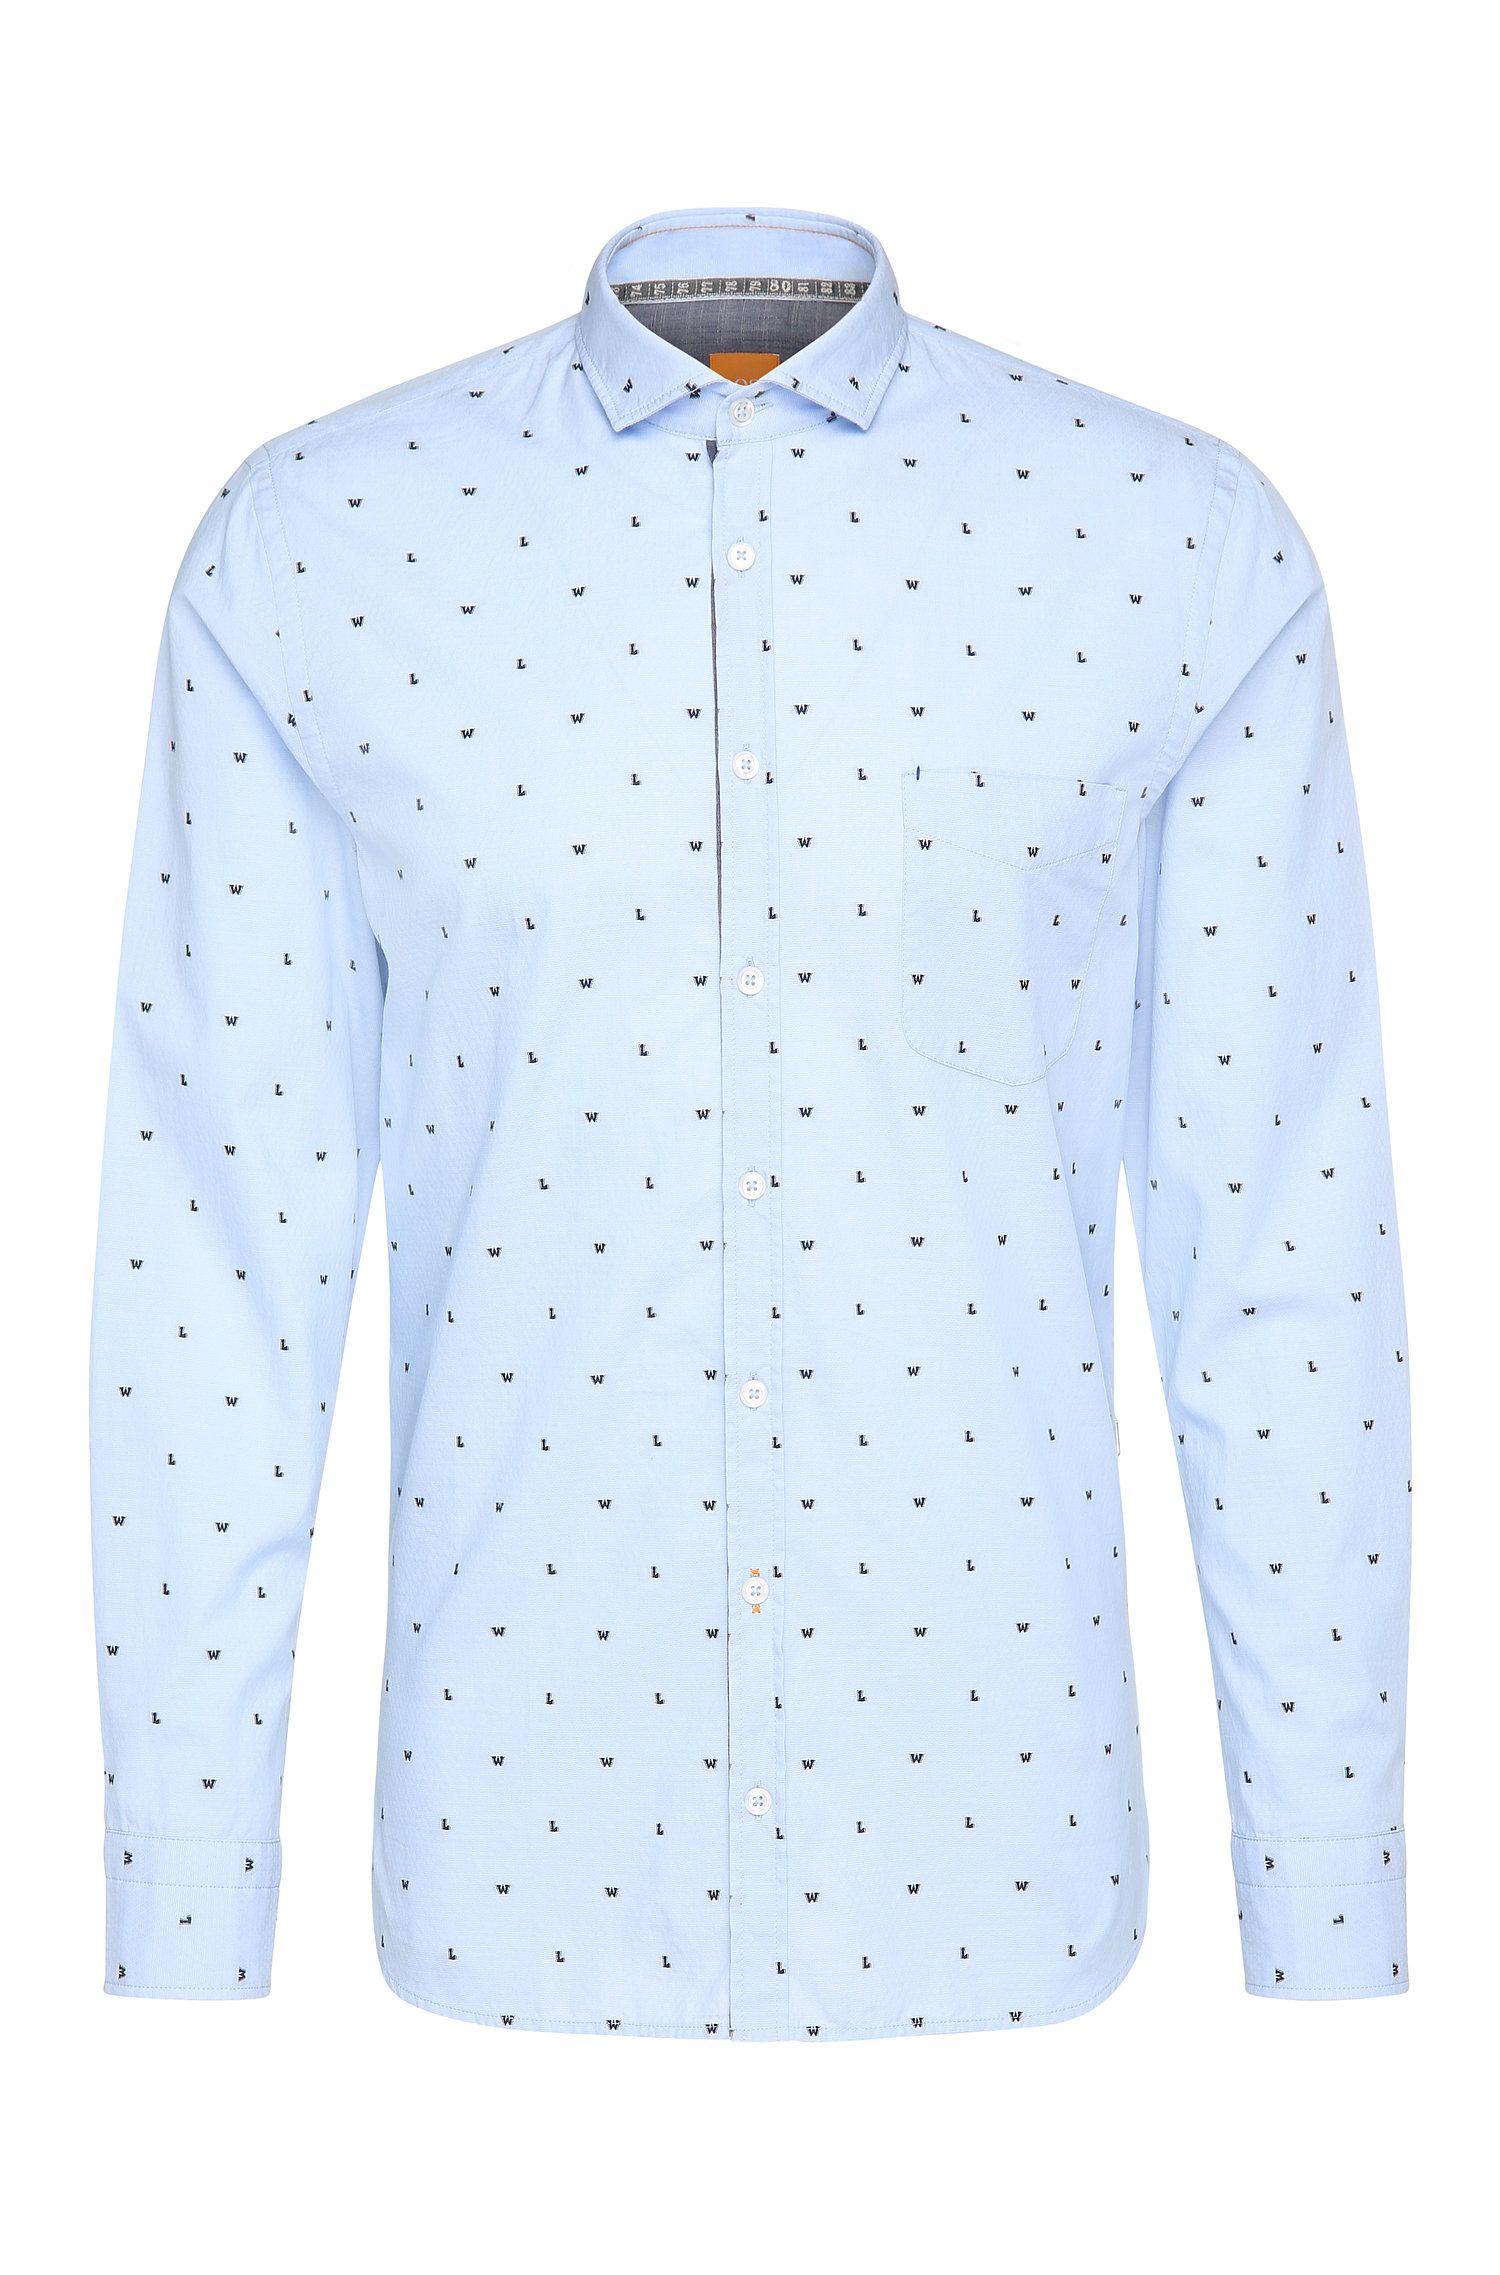 Gemustertes Slim-Fit Hemd aus Baumwoll-Jacquard: ´Cattitude`